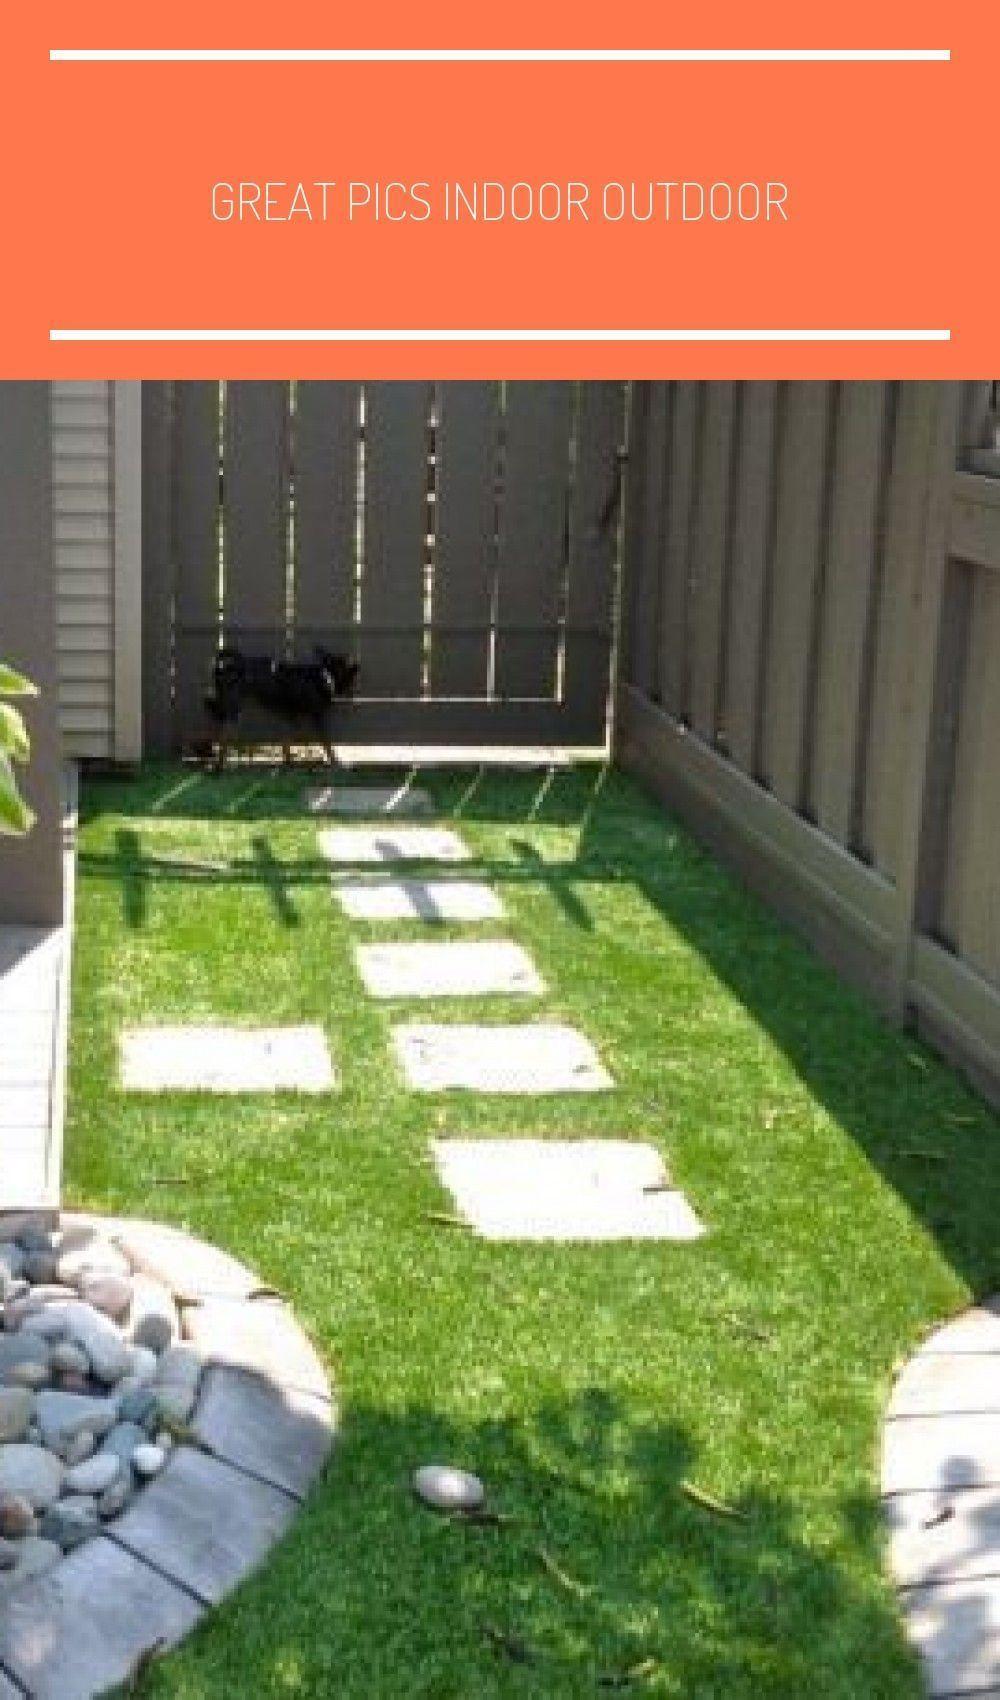 Great pics indoor outdoor dog run dog kennel building